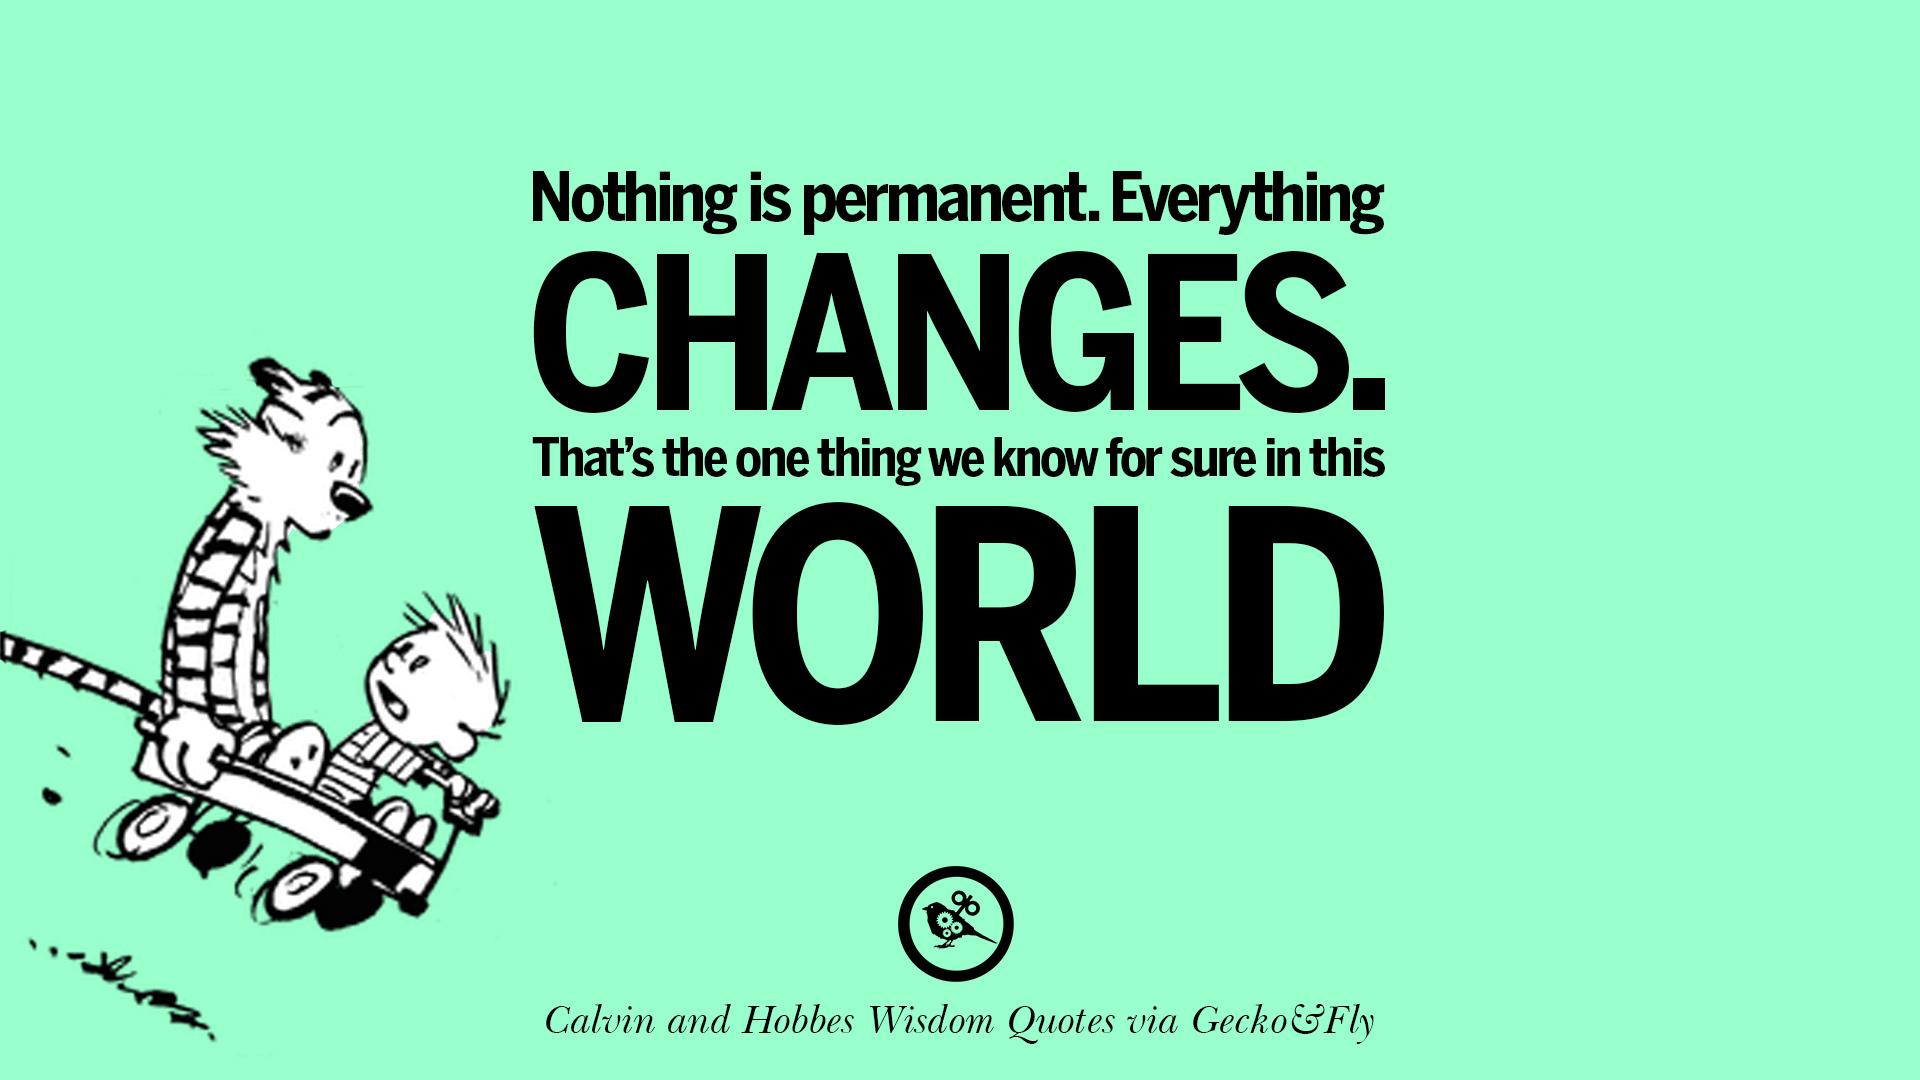 Amazing Wallpaper Mac Calvin And Hobbes - calvin-hobbes-quotes-wisdom-06  Graphic_855126.jpg